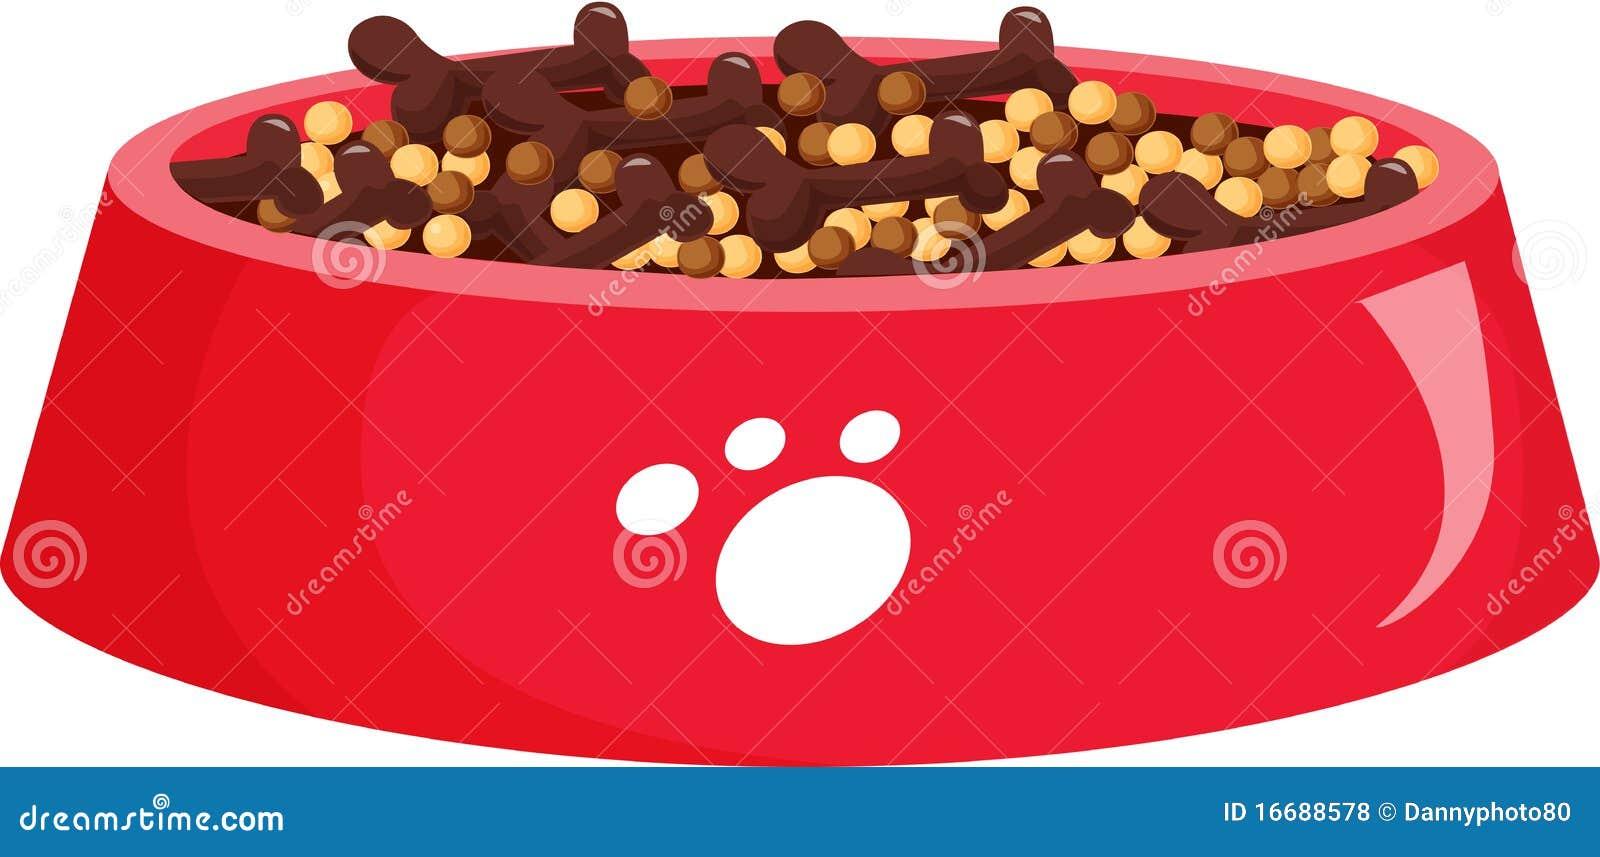 Dog food stock illustration. Illustration of background ...